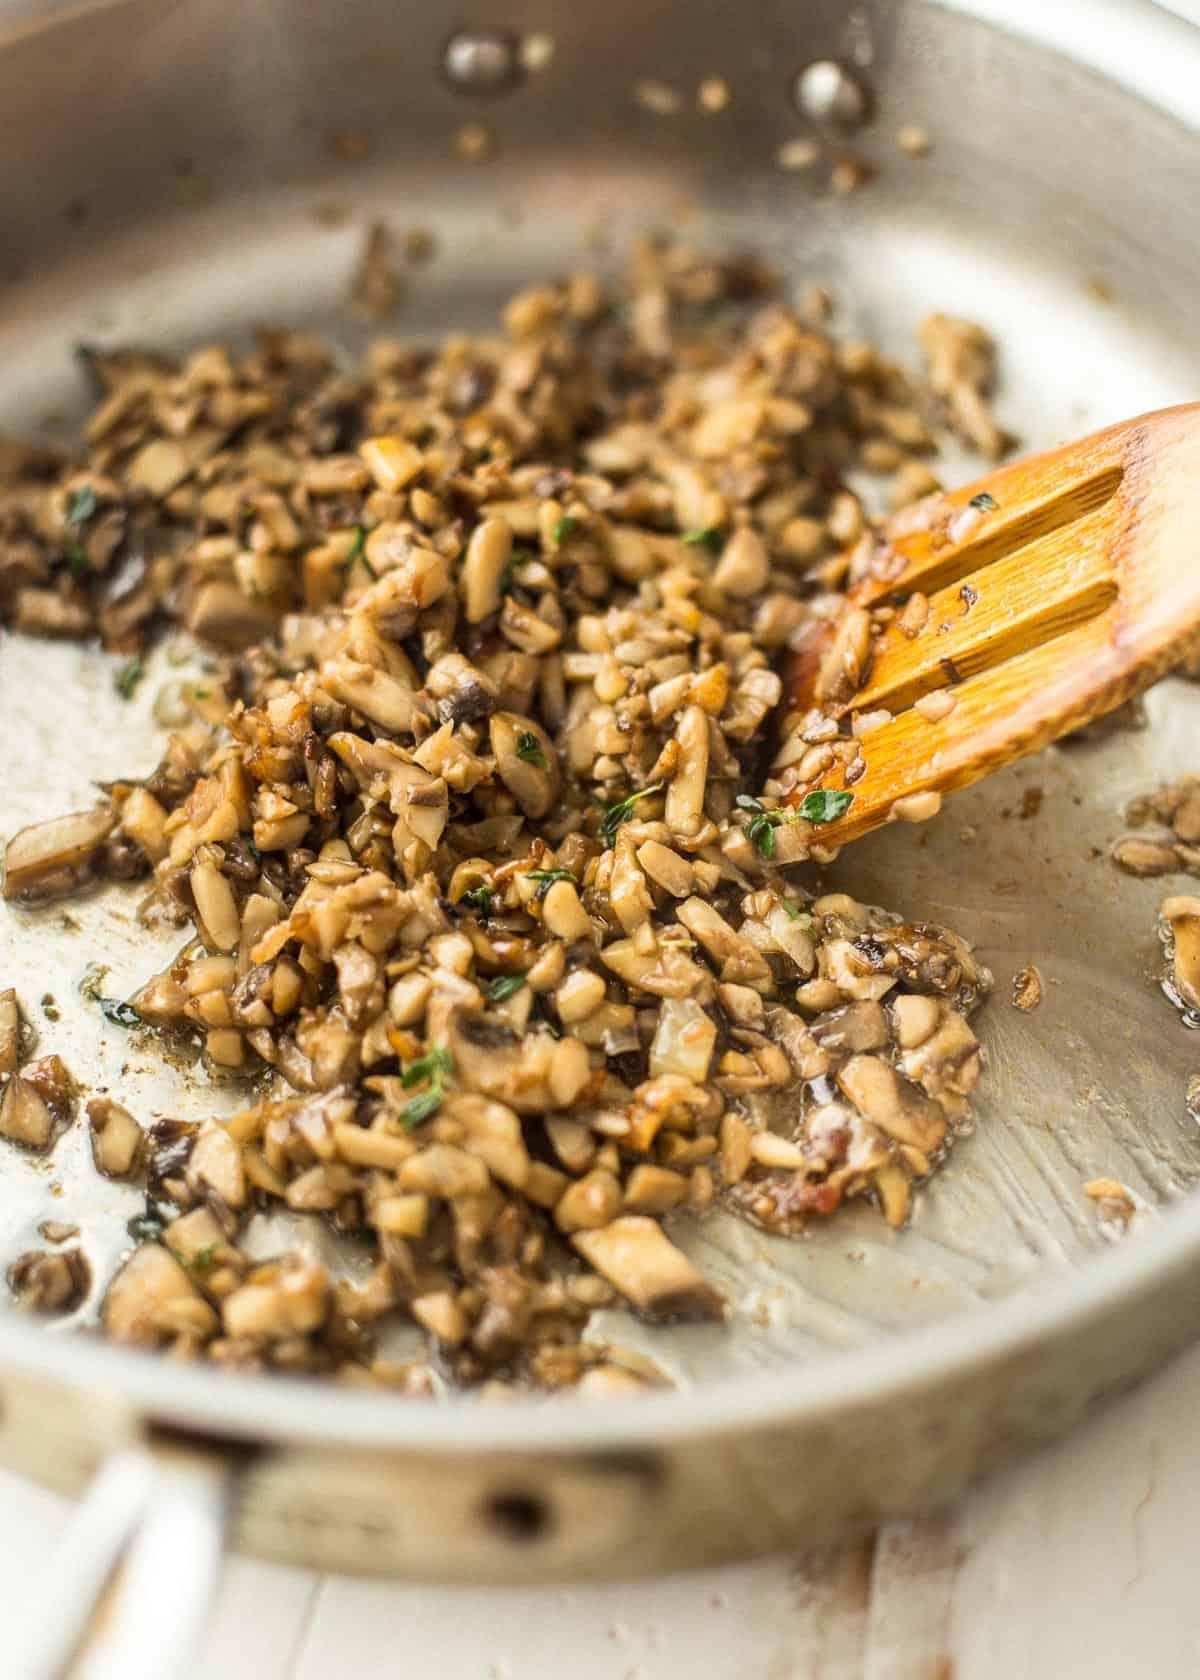 sautéing mushrooms in a pan